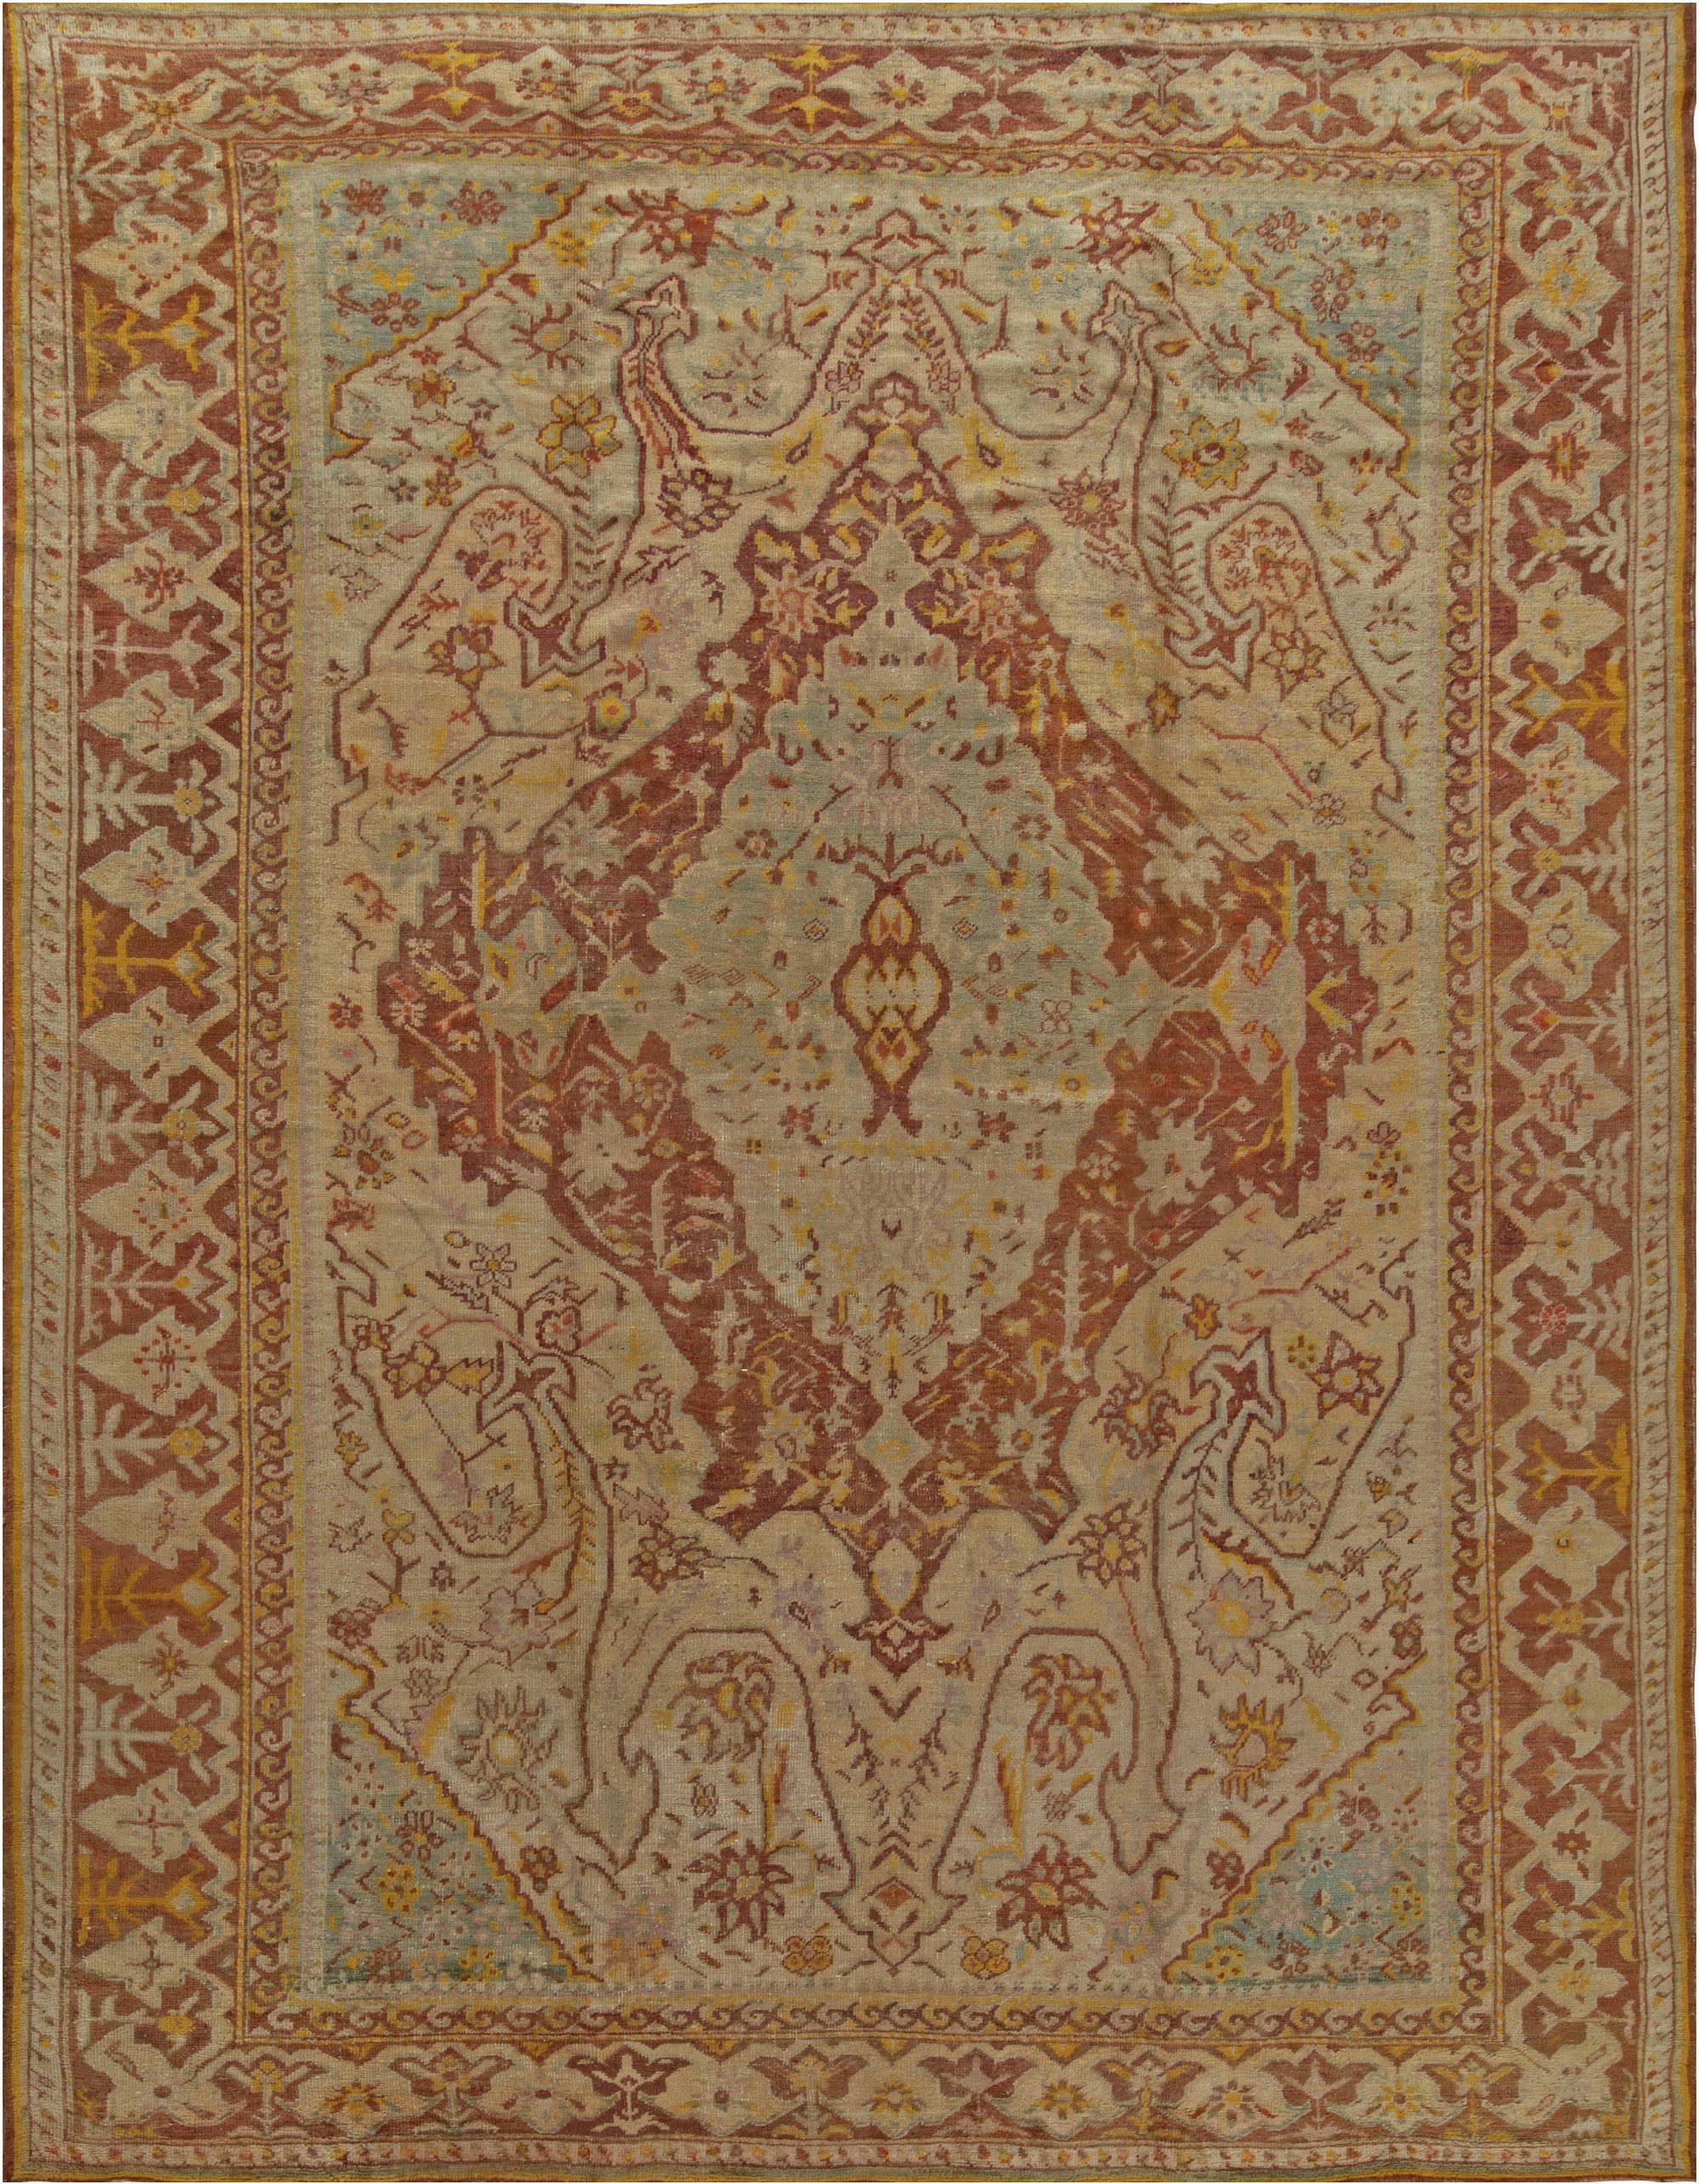 19th Century Turkish Oushak Handwoven Wool Rug BB6830